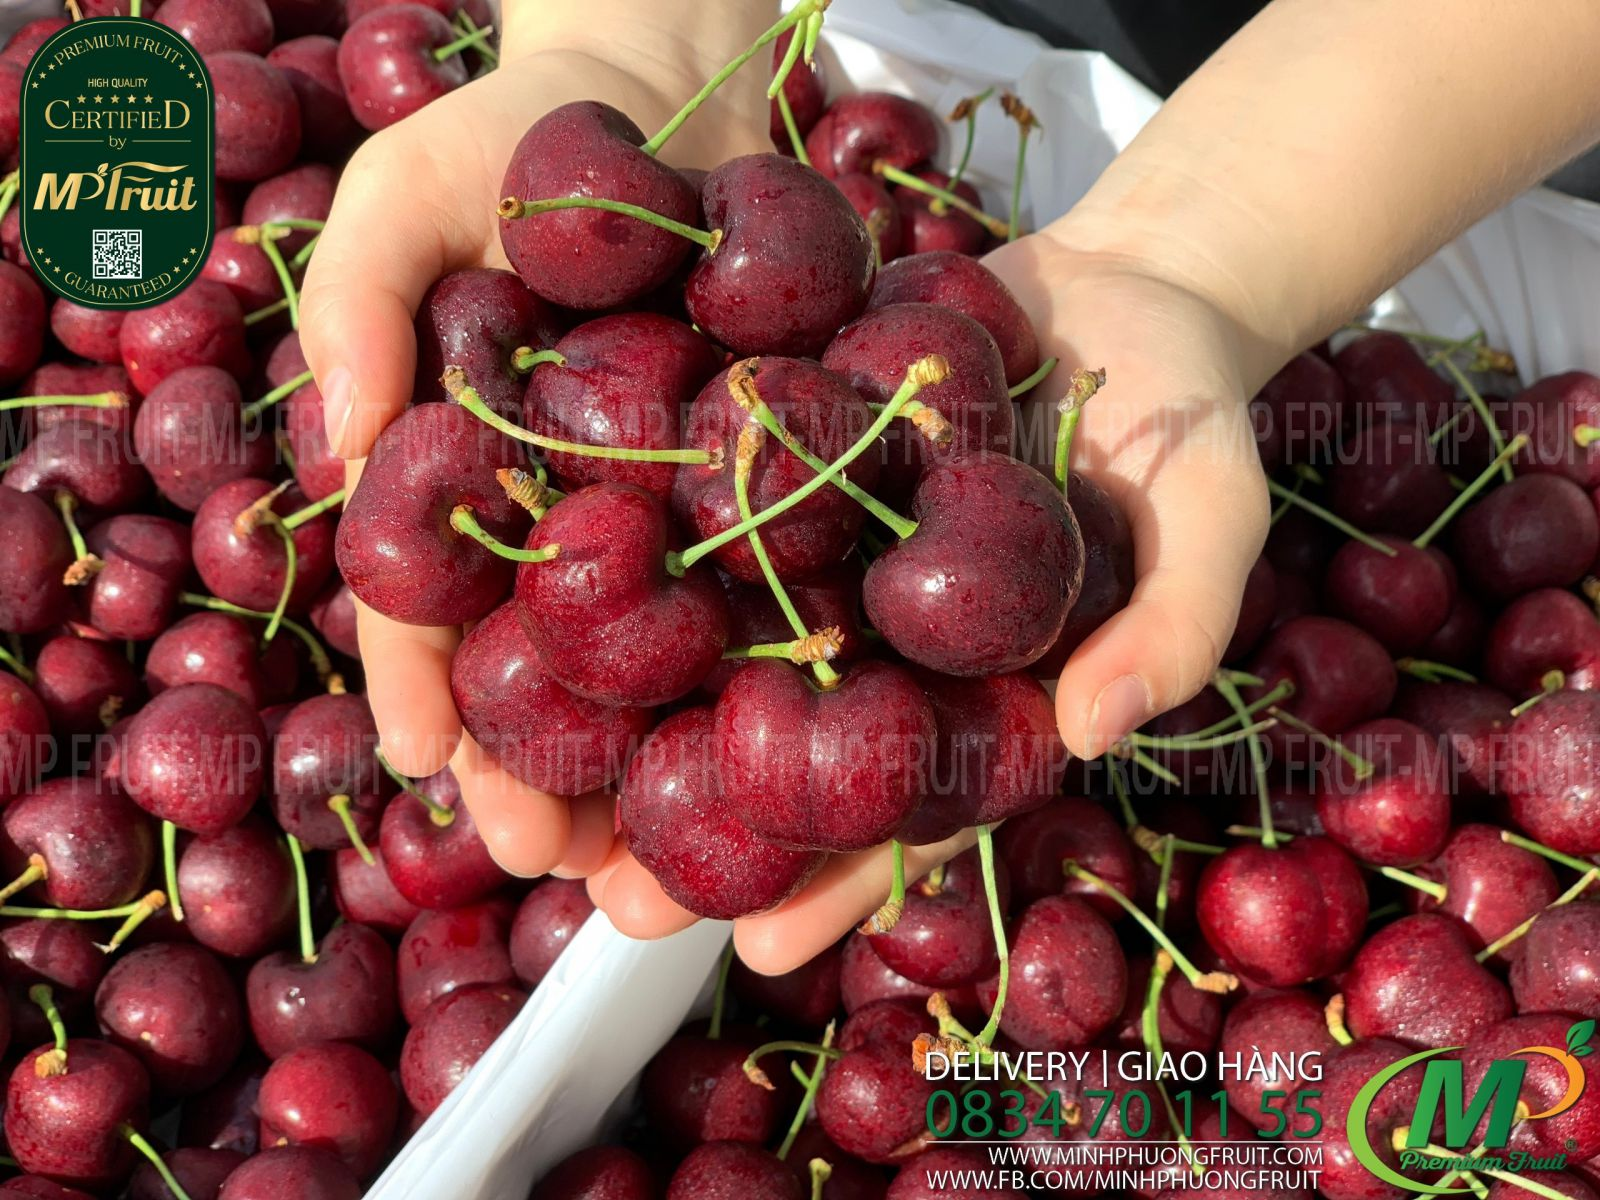 Cherry Đỏ Jealous Canada Size 8.5 tại MP Fruits